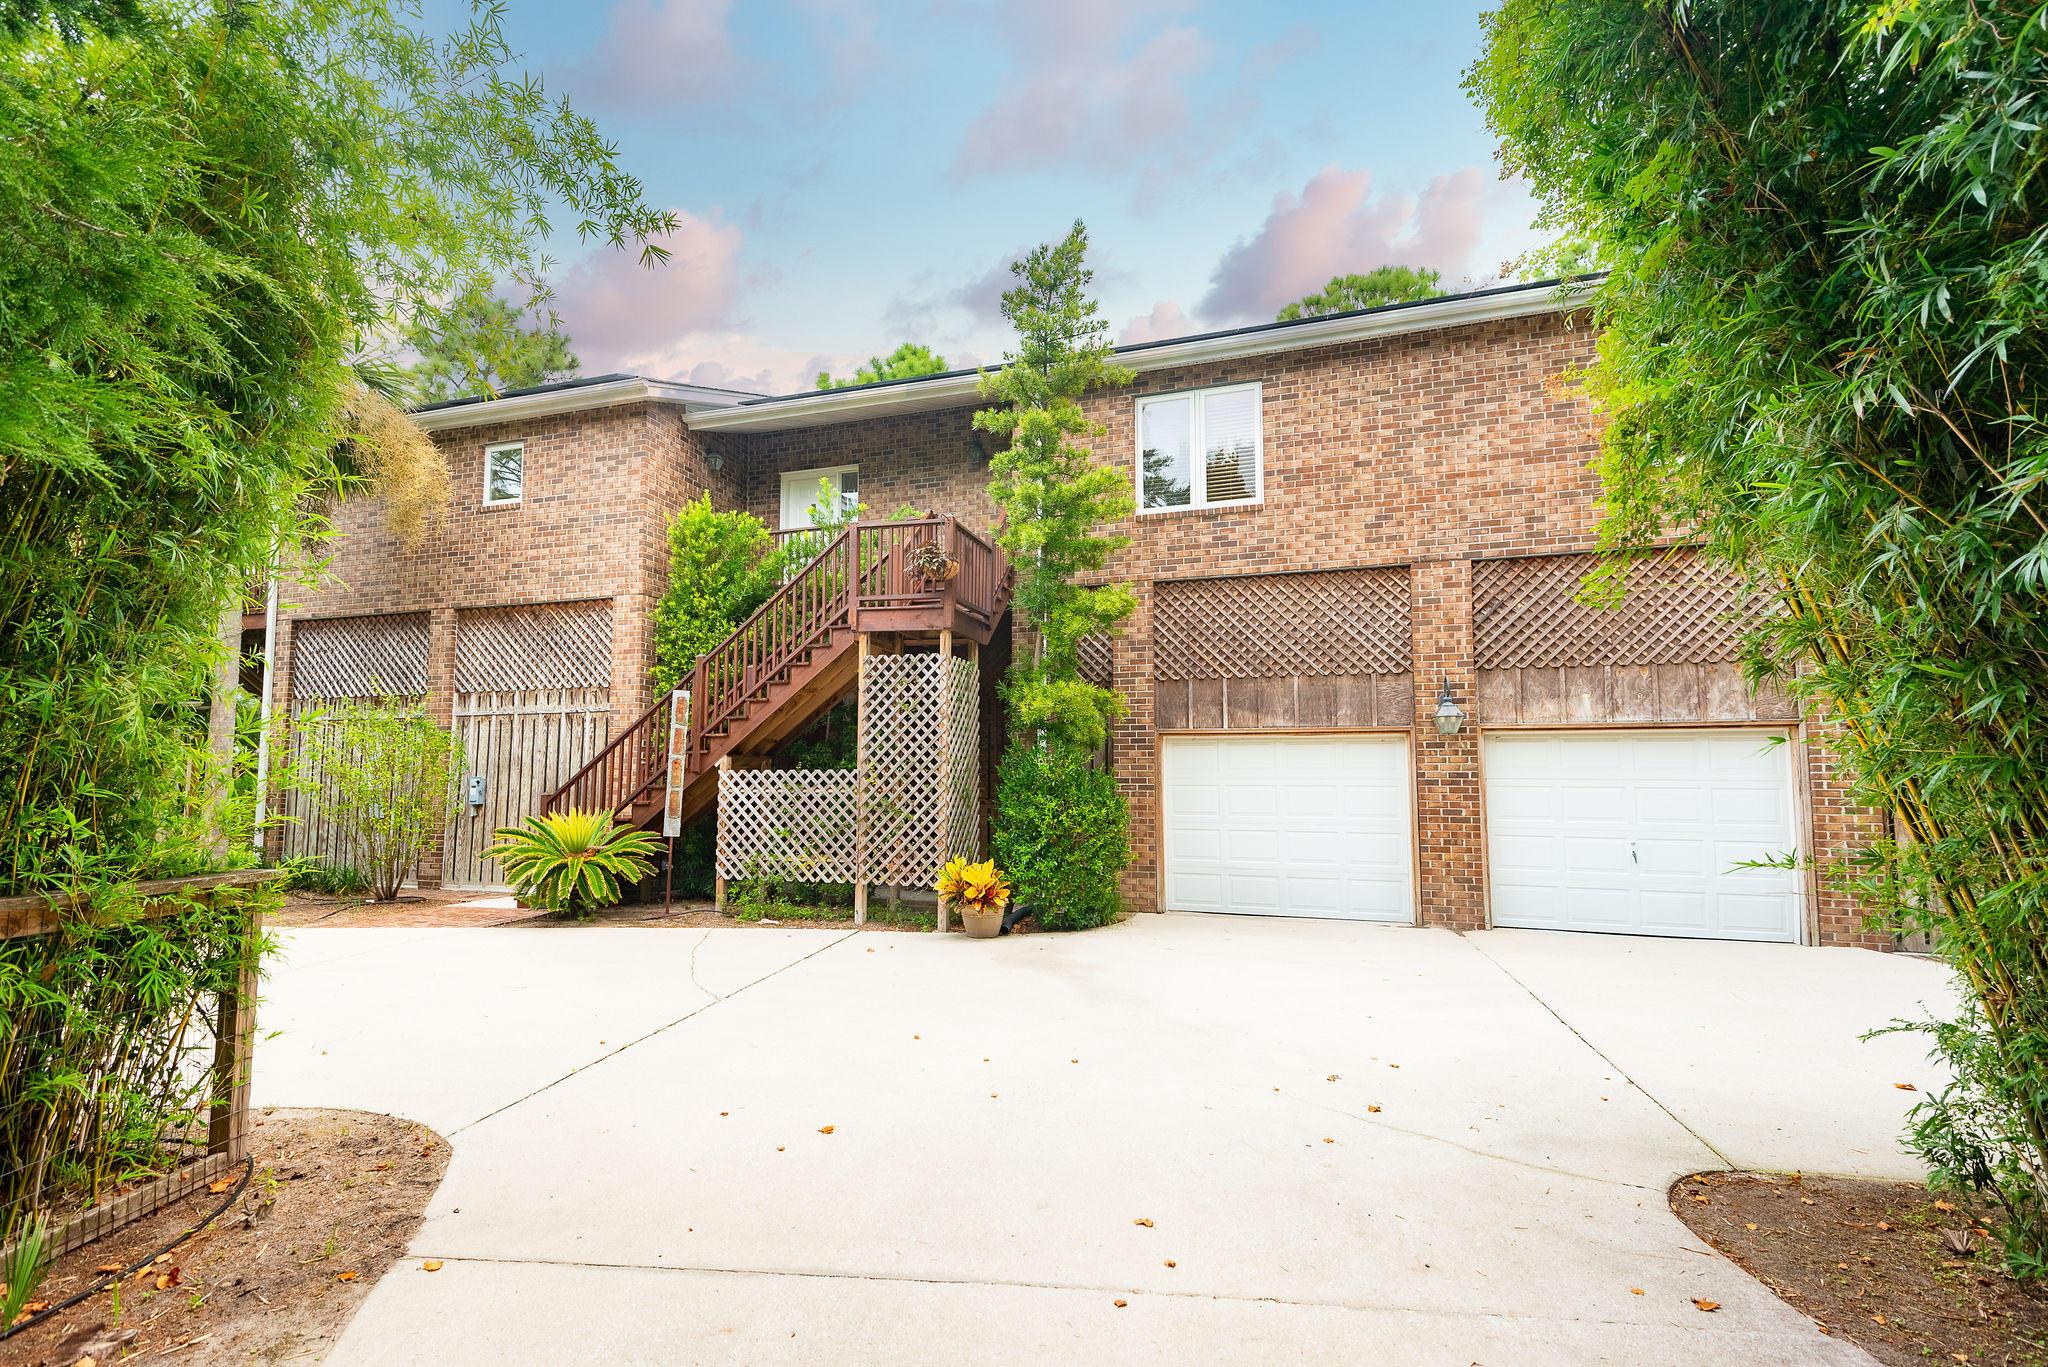 Home Farm Homes For Sale - 1564 Home Farm, Mount Pleasant, SC - 28